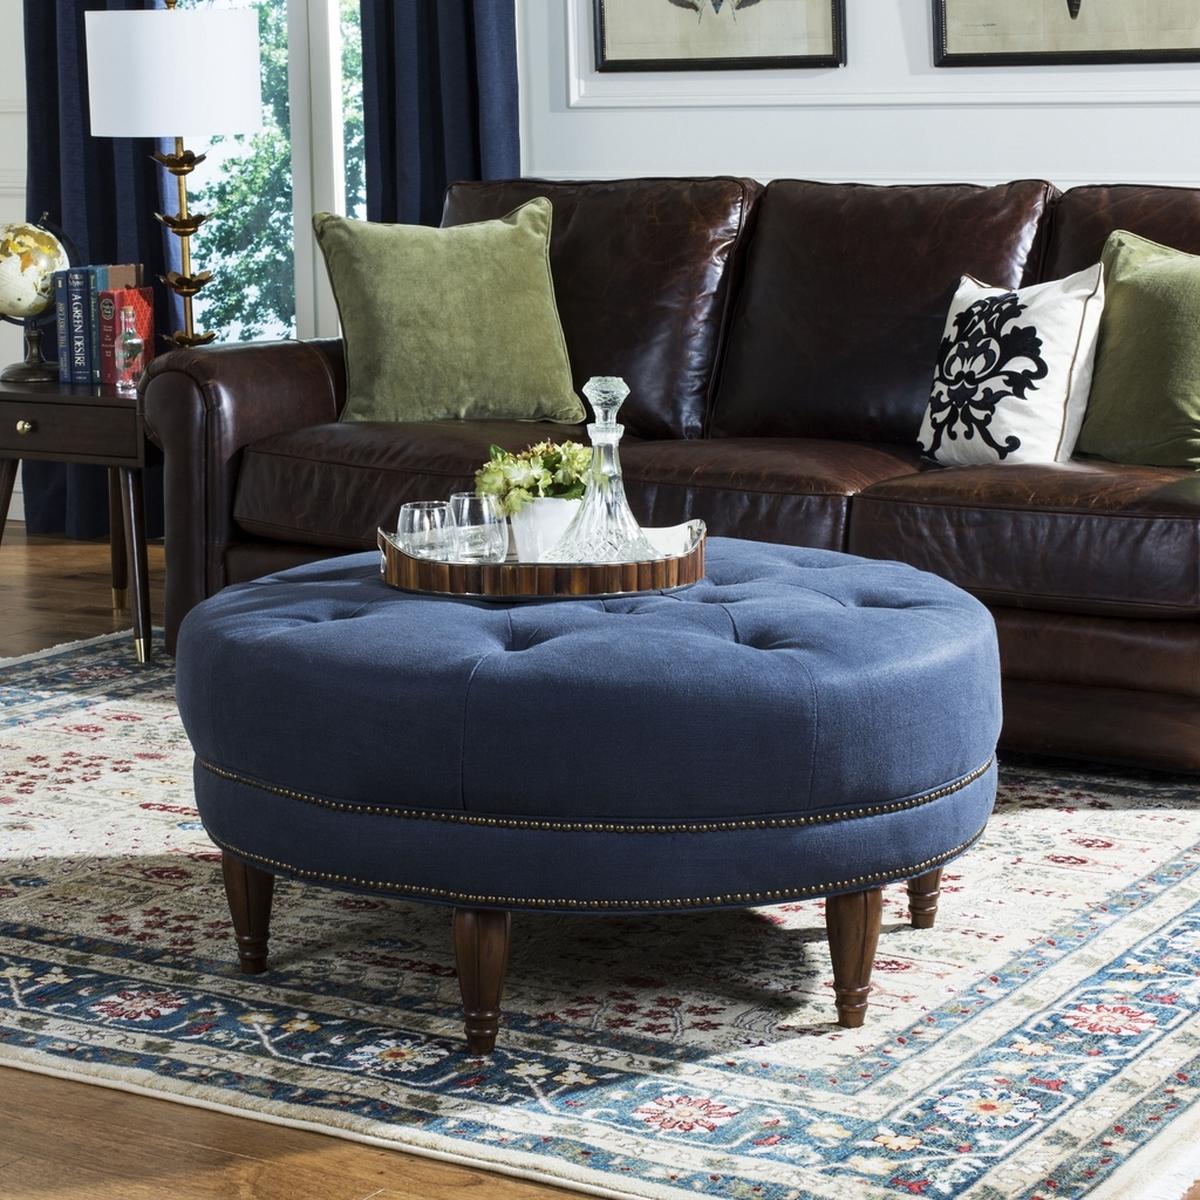 Wondrous Tufted Upholstered Nailhead Round Ottoman Safavieh Com Alphanode Cool Chair Designs And Ideas Alphanodeonline